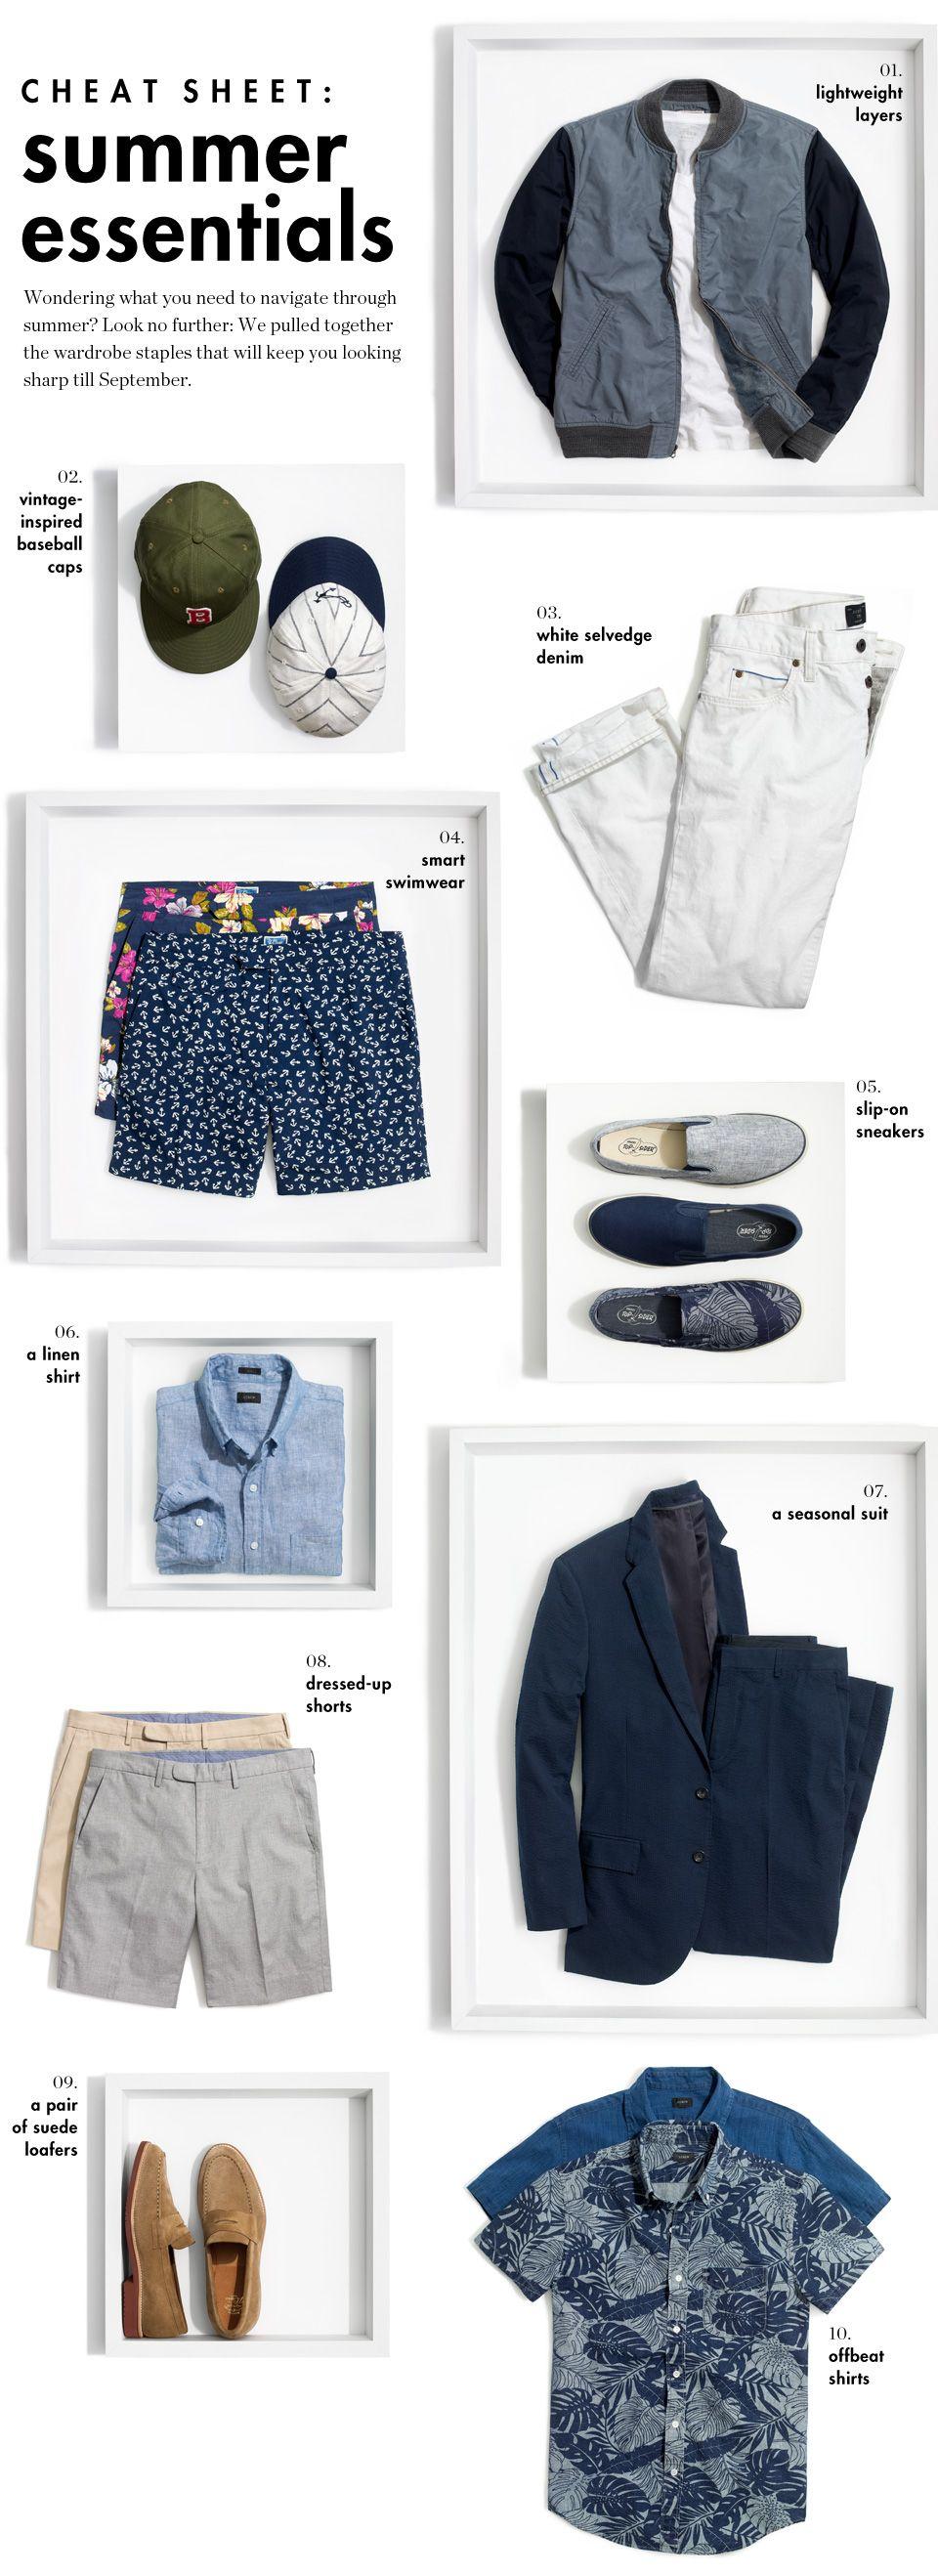 J Crew Men s Clothing Cheat Sheet Summer Essentials